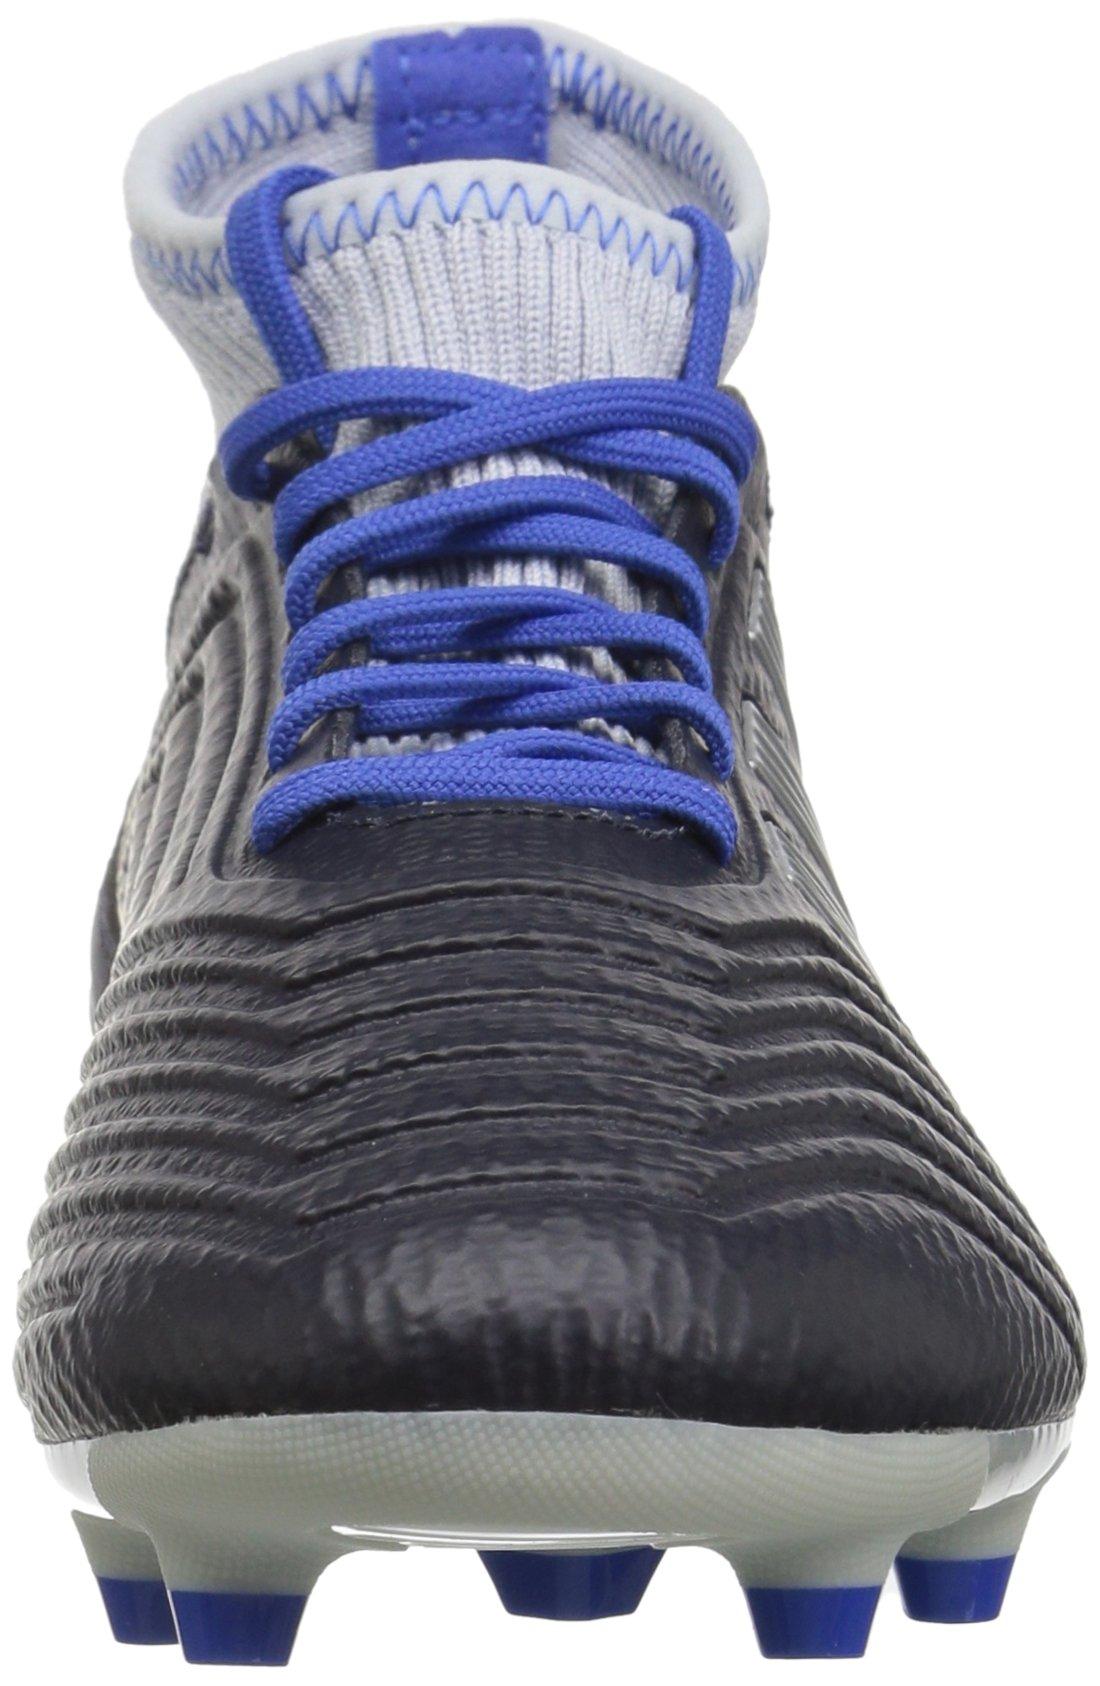 adidas Women's Predator 18.3 Firm Ground Soccer Shoe Legend Ink/Silver Metallic/aero Blue 5.5 M US by adidas (Image #4)